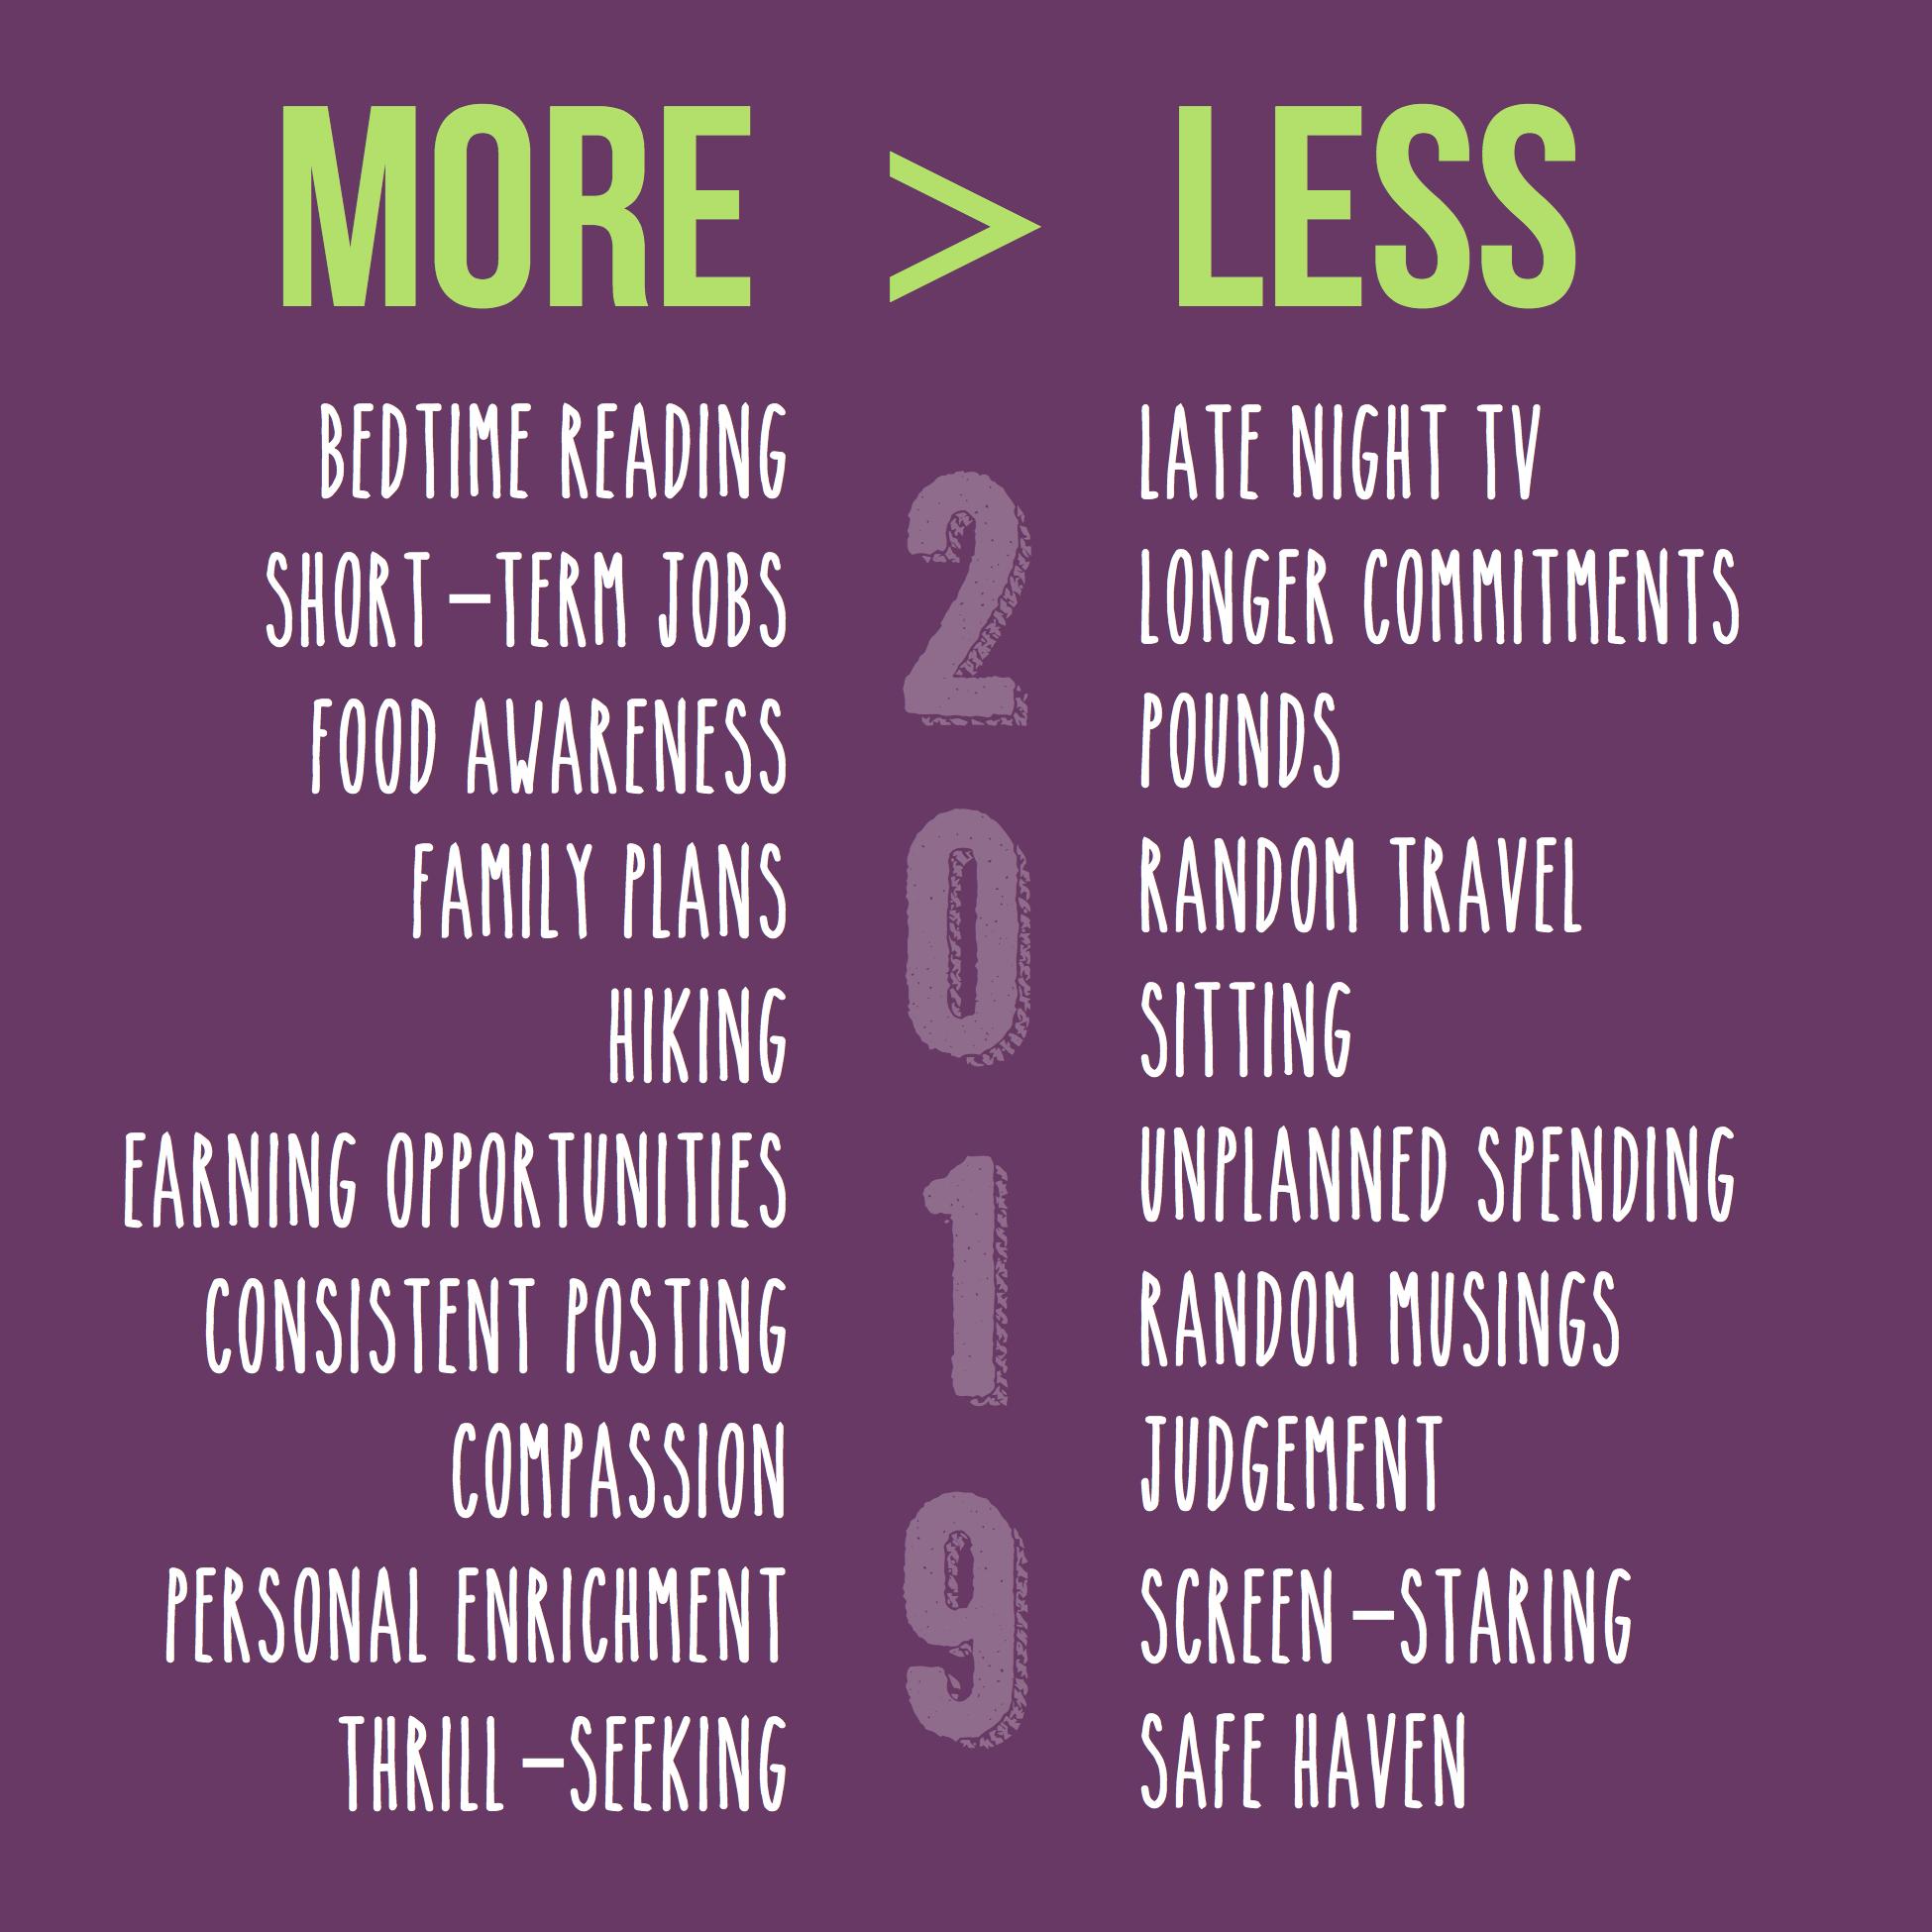 2019 More : Less List copy.jpg